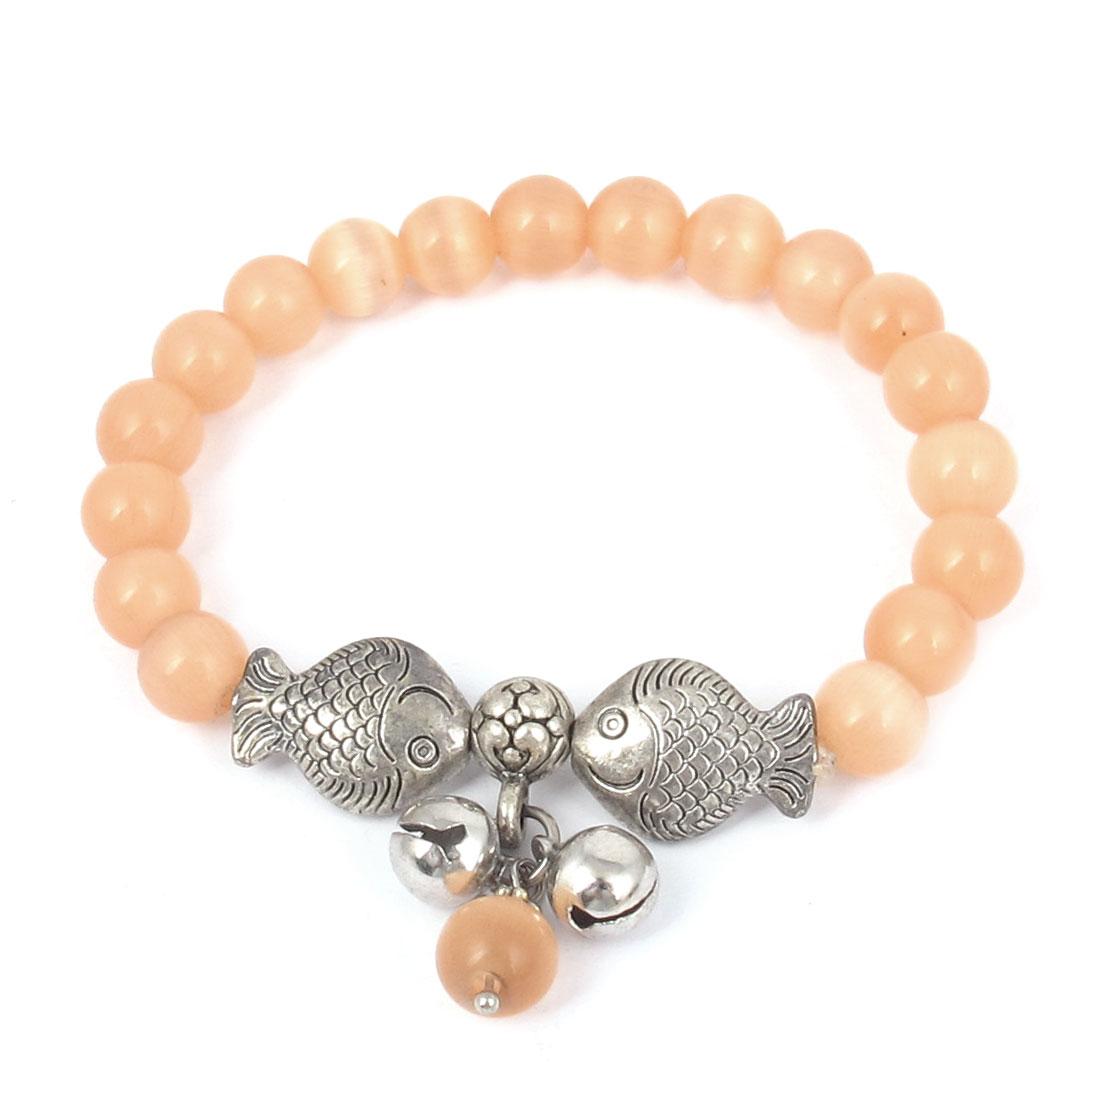 Fish Detail Round Opal Bead Wrist Ornament Bangle Bracelet Light Orange Silver Tone for Women